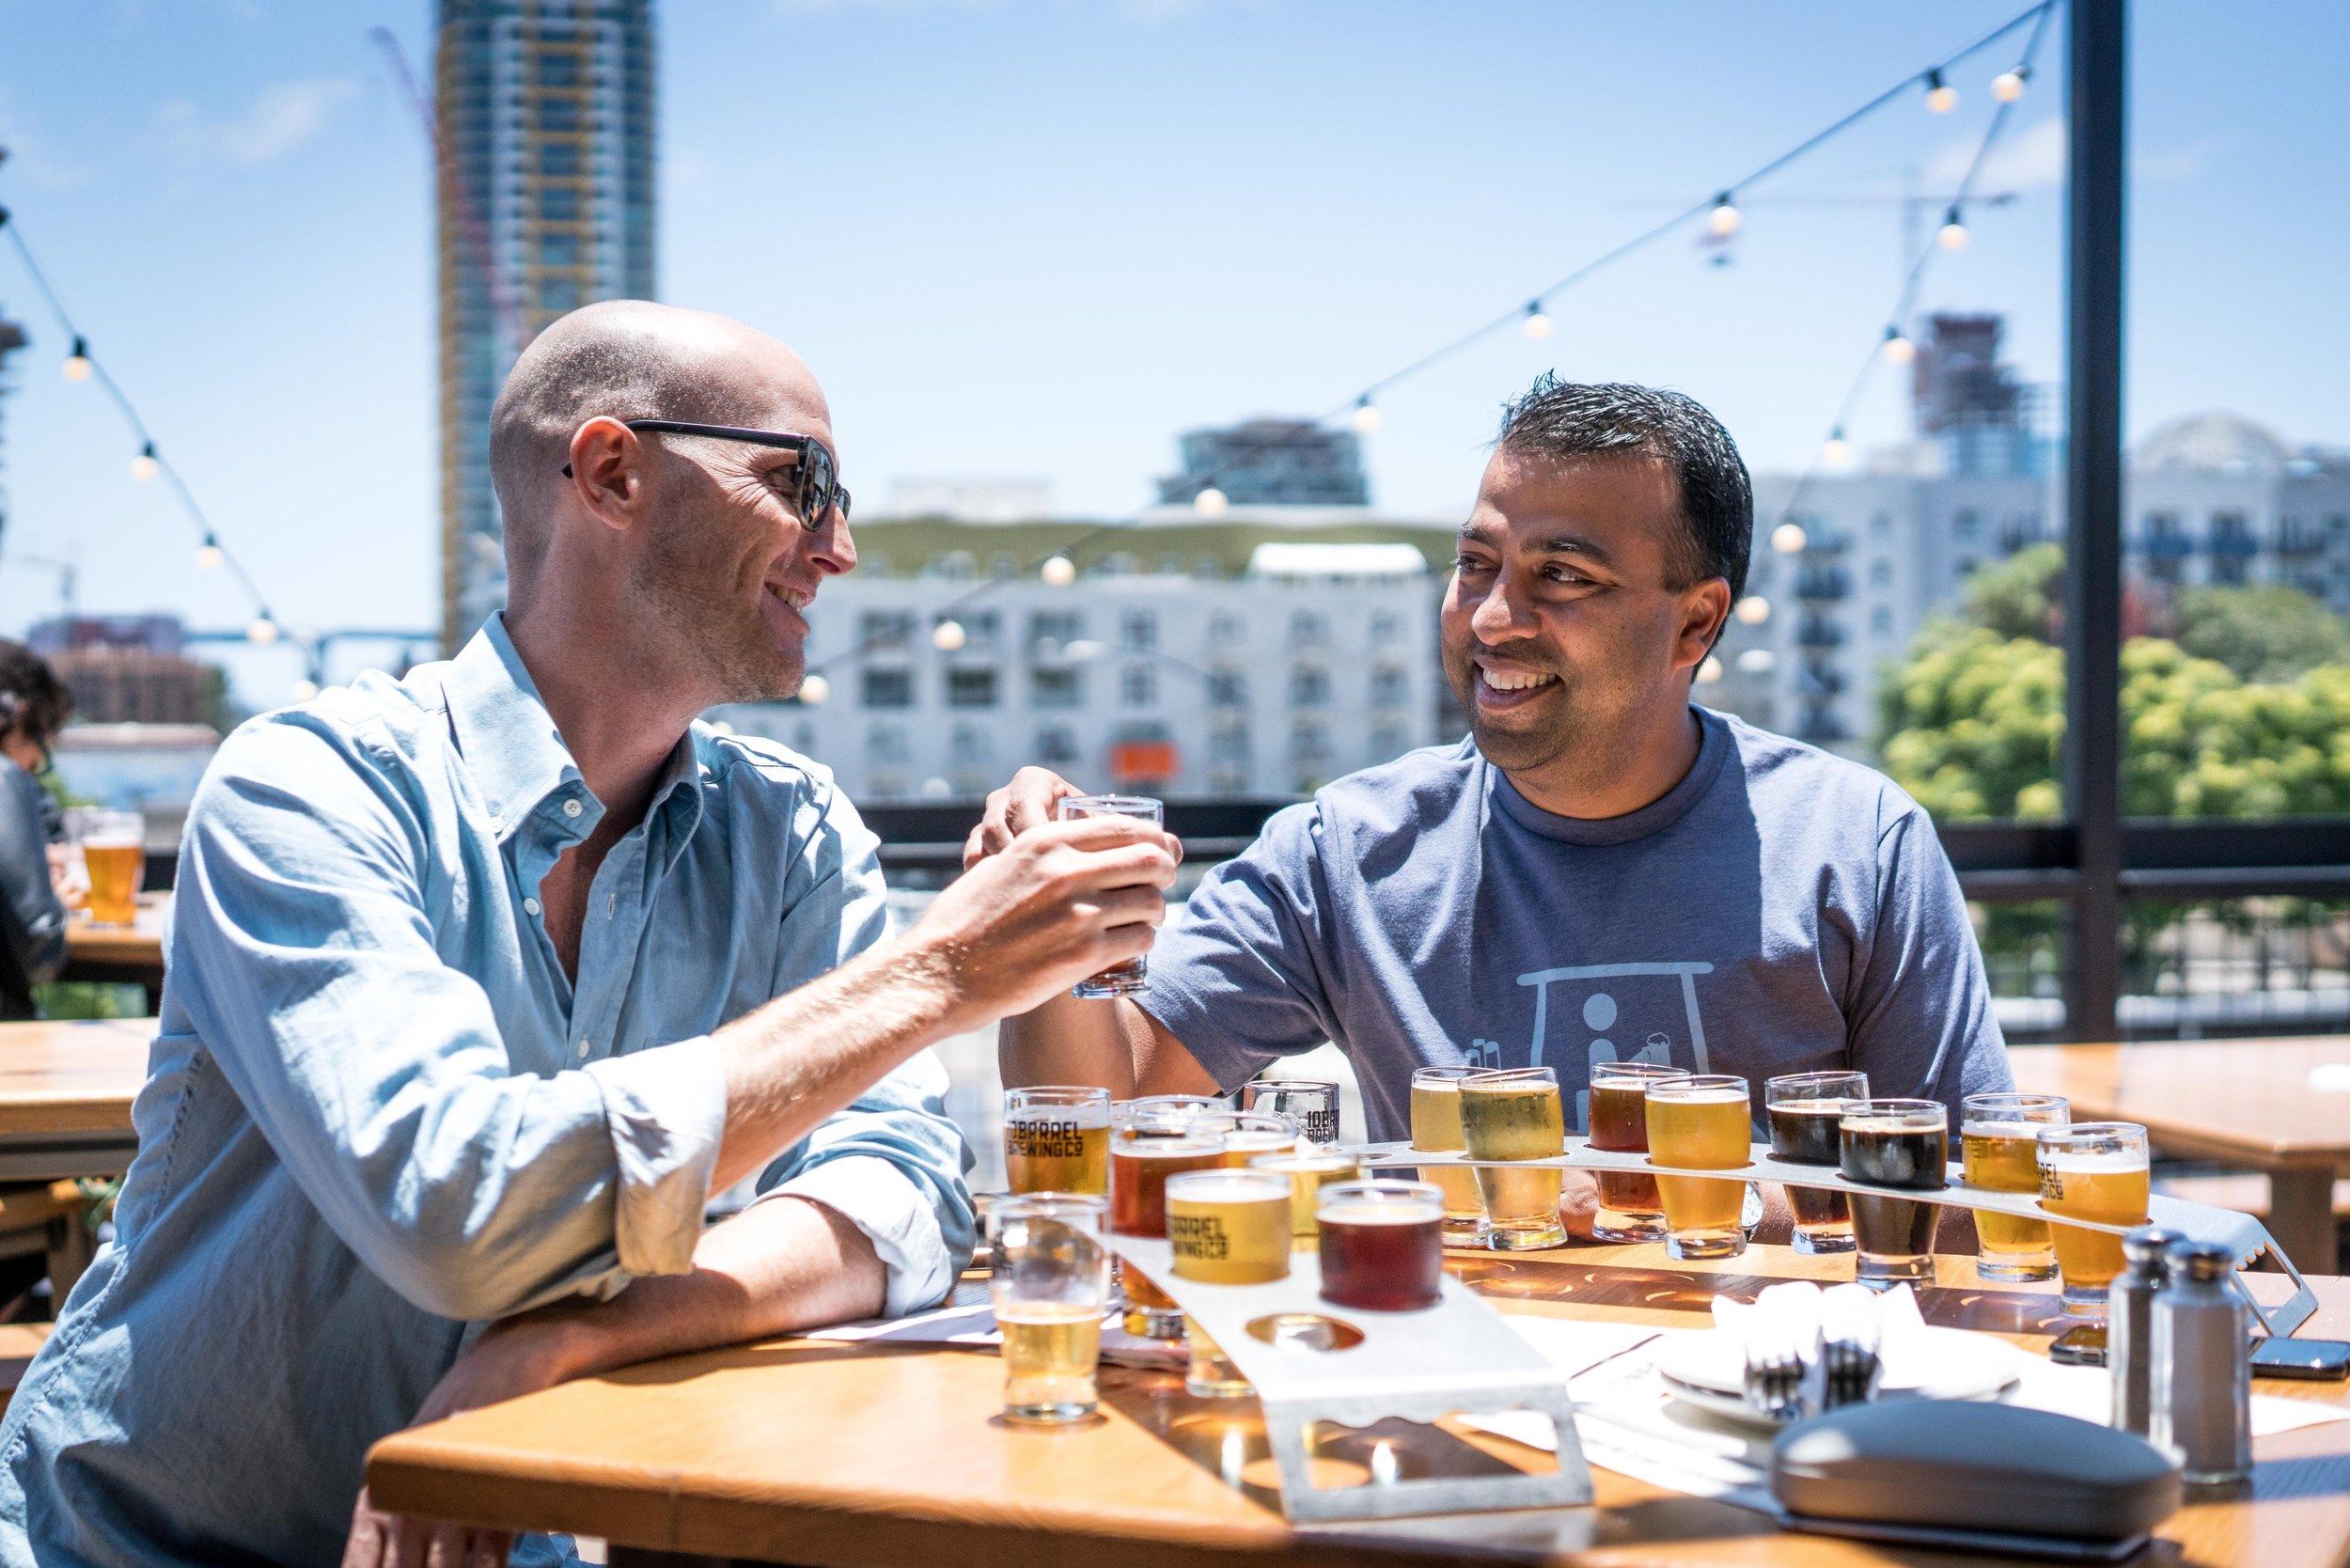 adults-alcoholic-beverage-beer-1267345.jpg